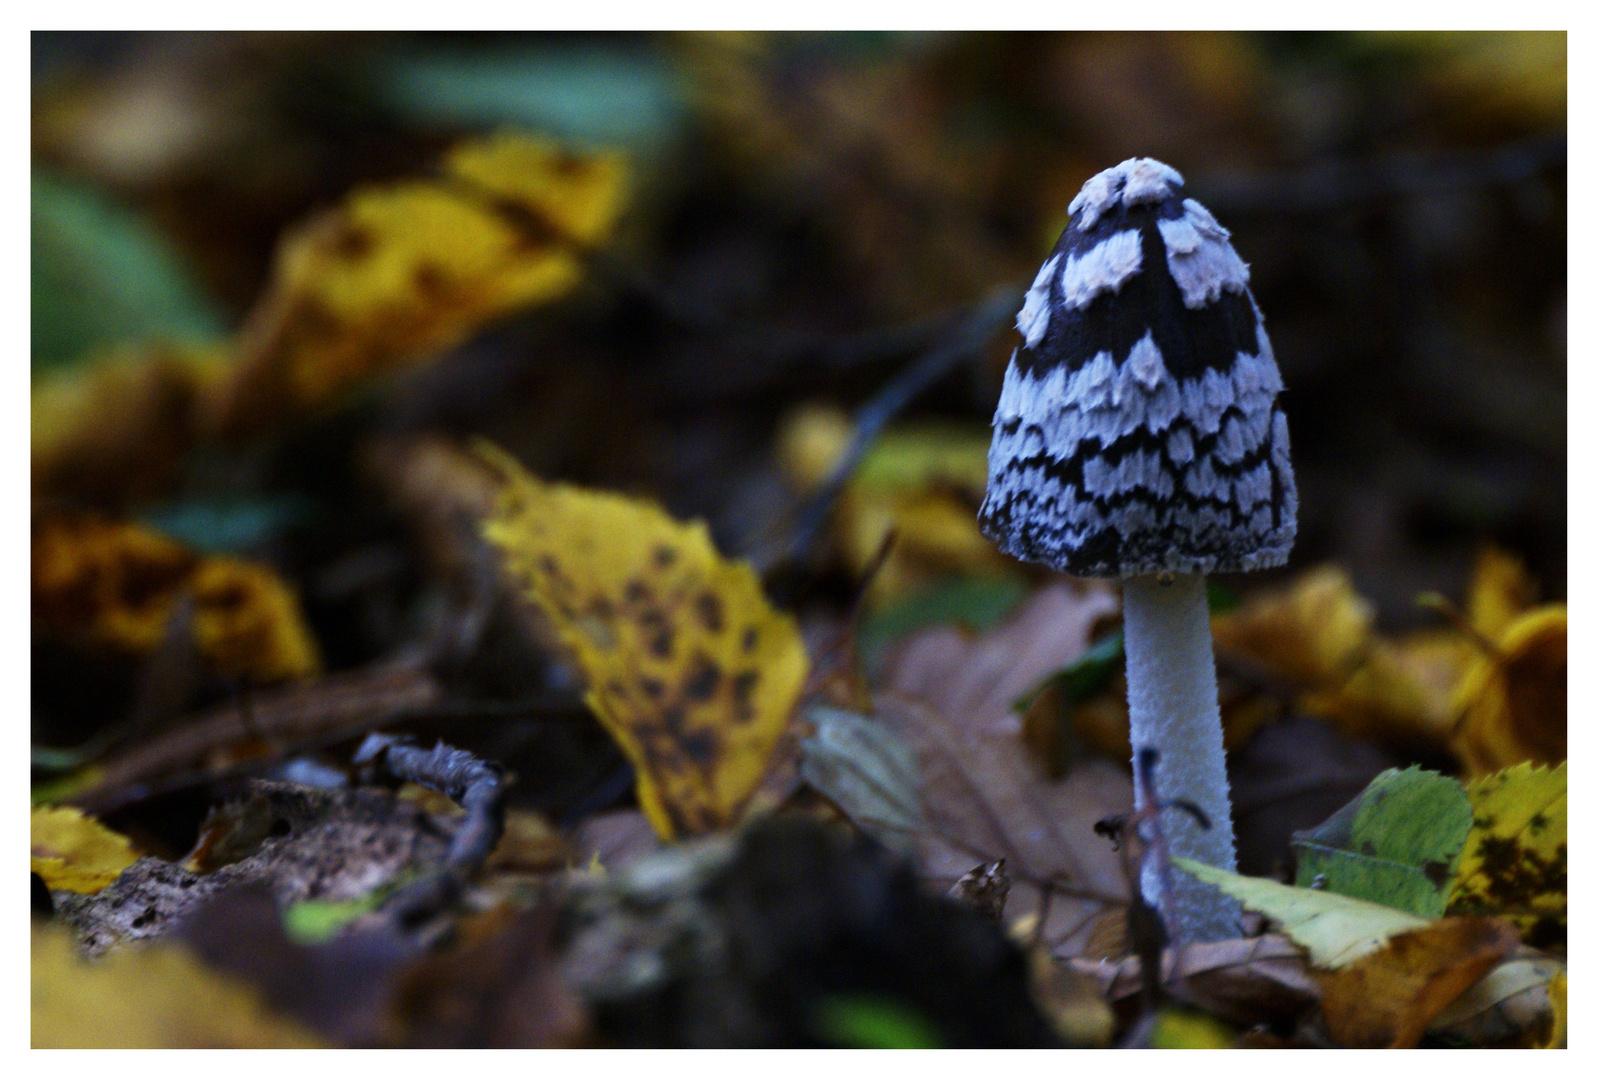 les champipi les champignons.....